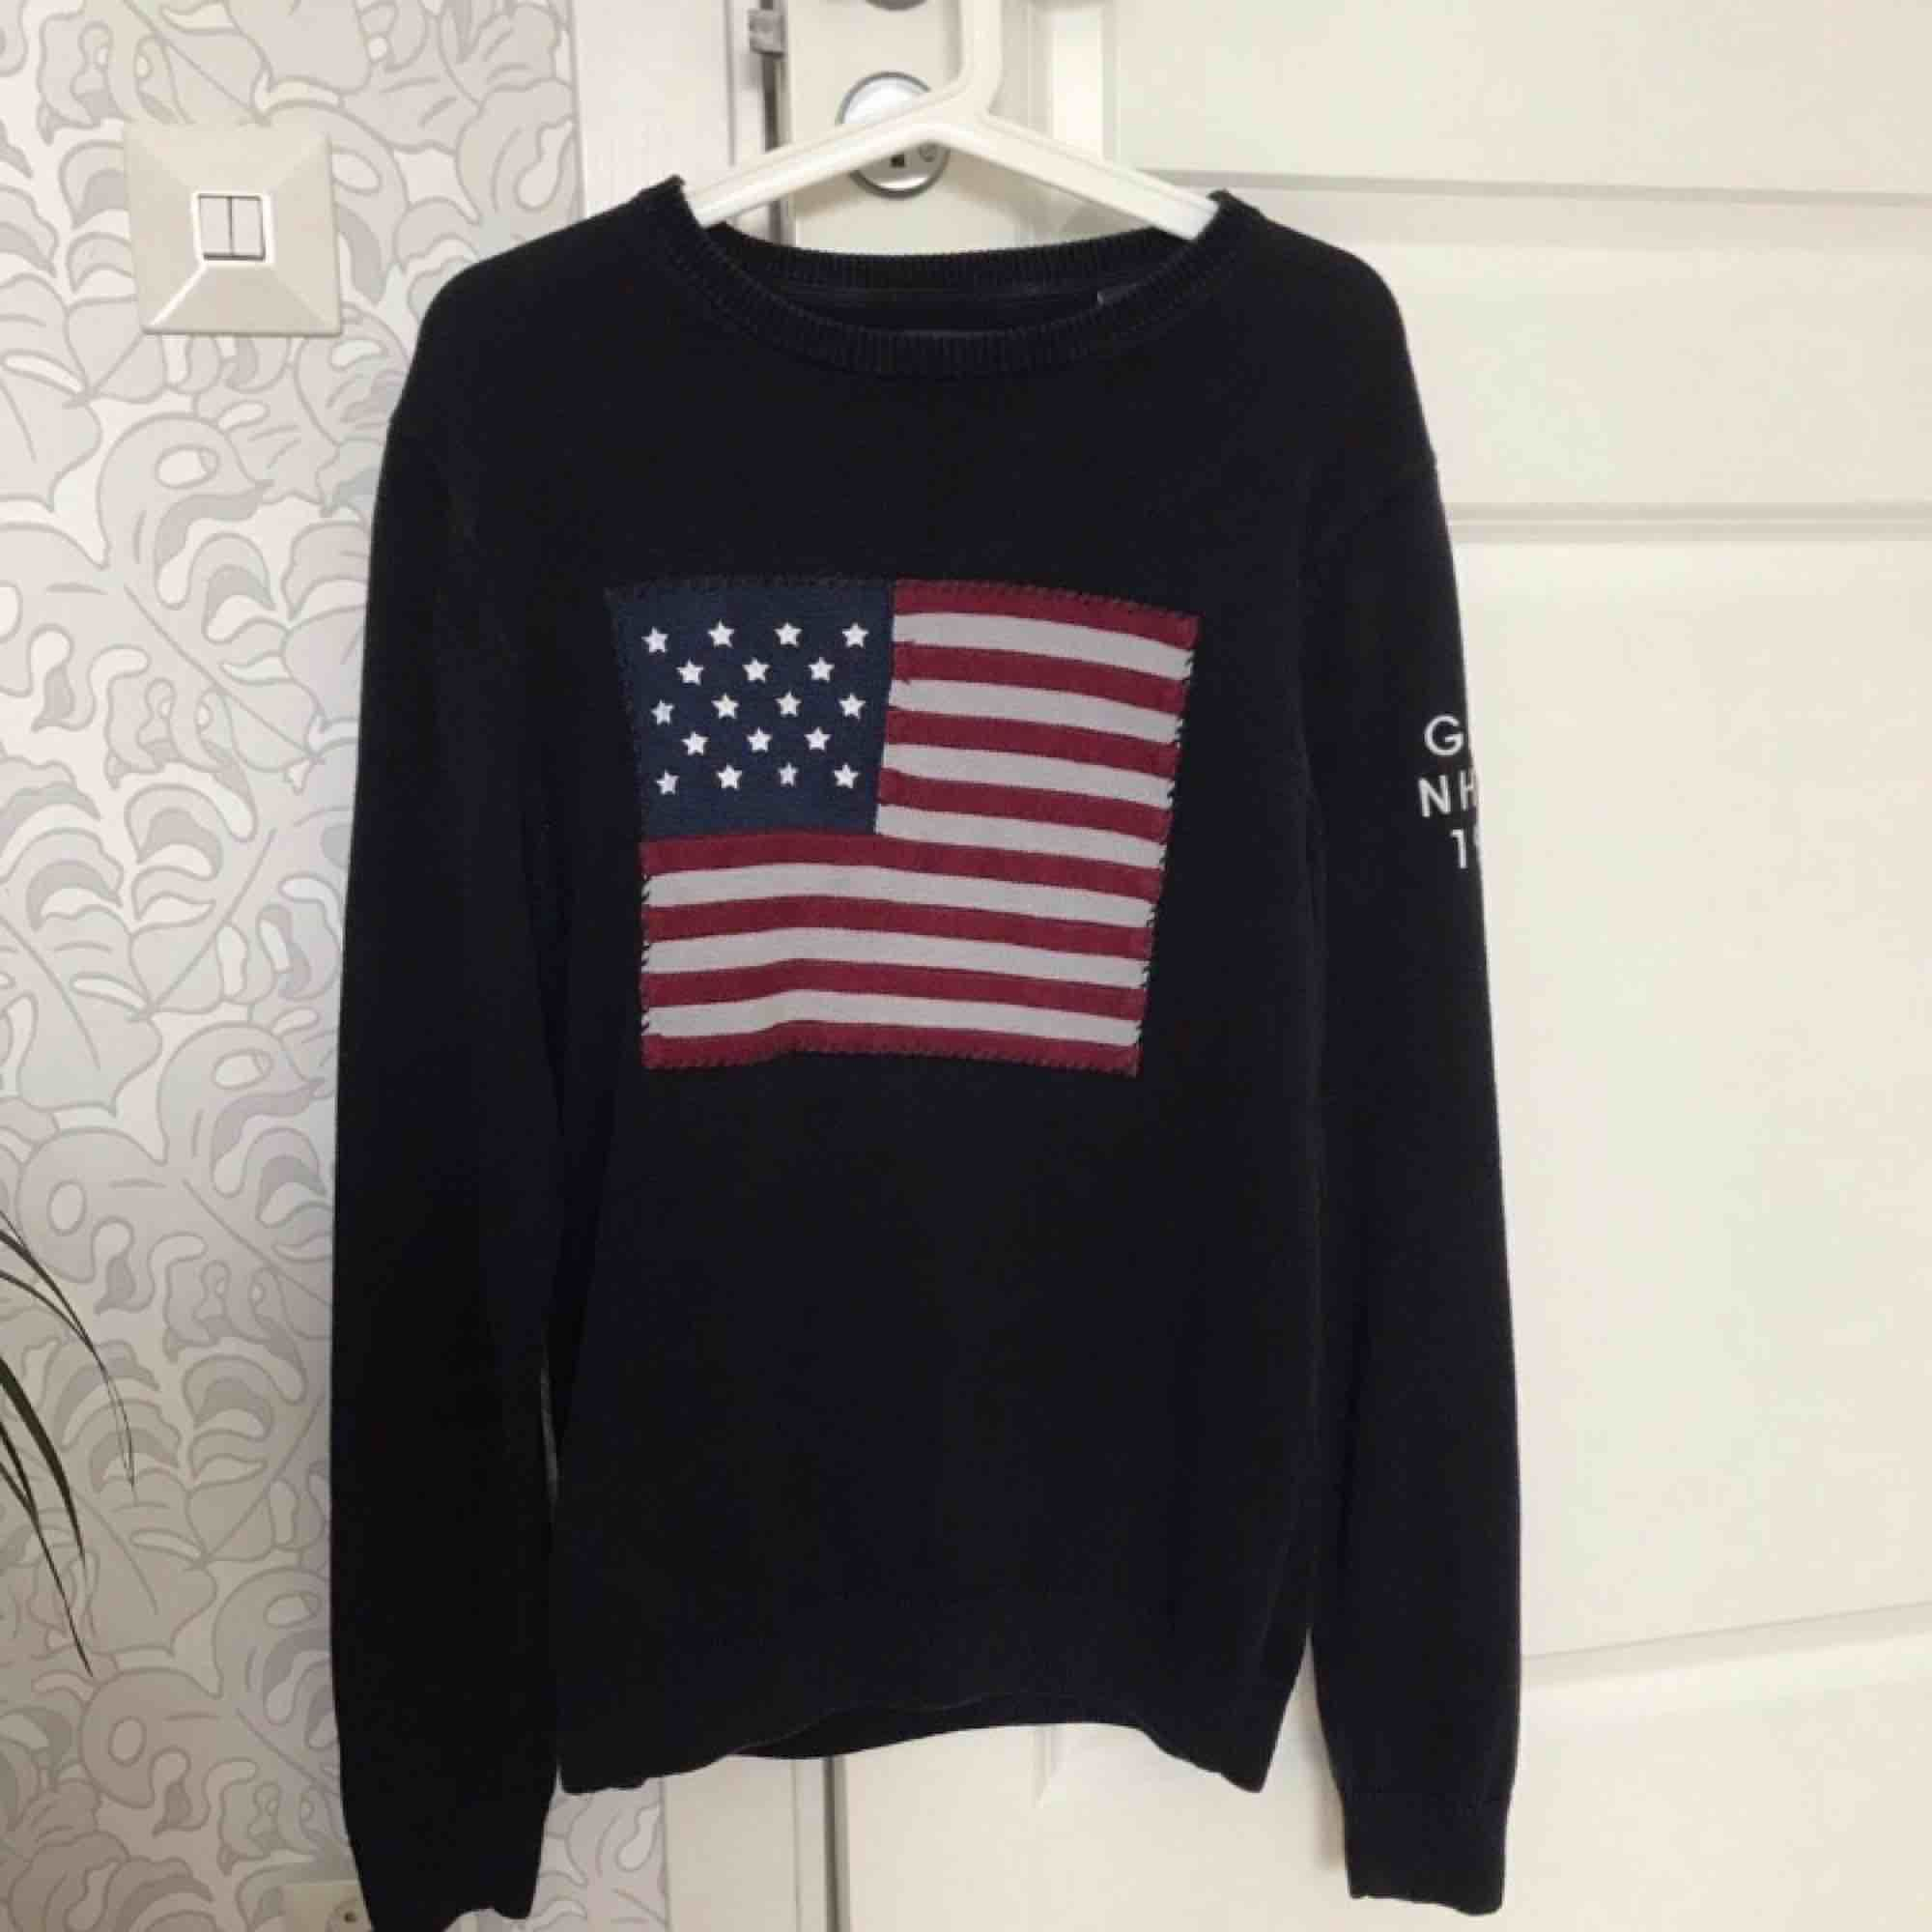 Svart Gant sweatshirt i storlek L (passar M mycket bra). Mycket bra skick.. Tröjor & Koftor.